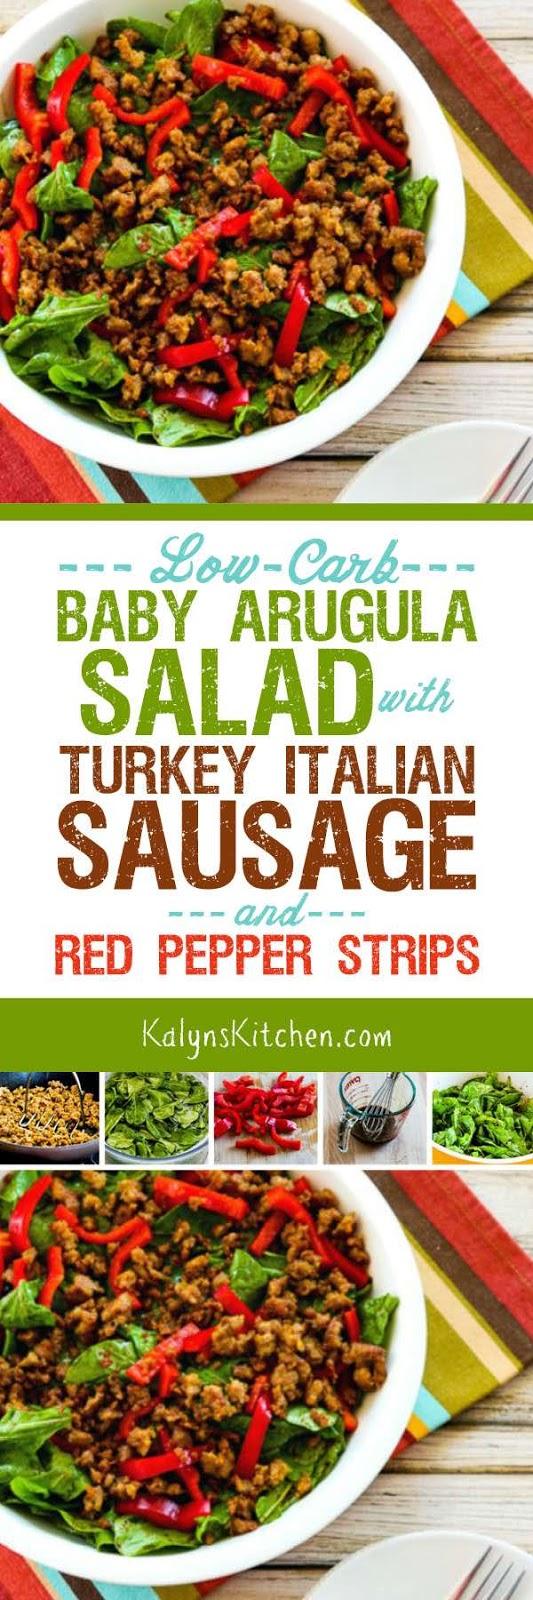 Low-Carb Baby Arugula Salad with Turkey Italian Sausage ...